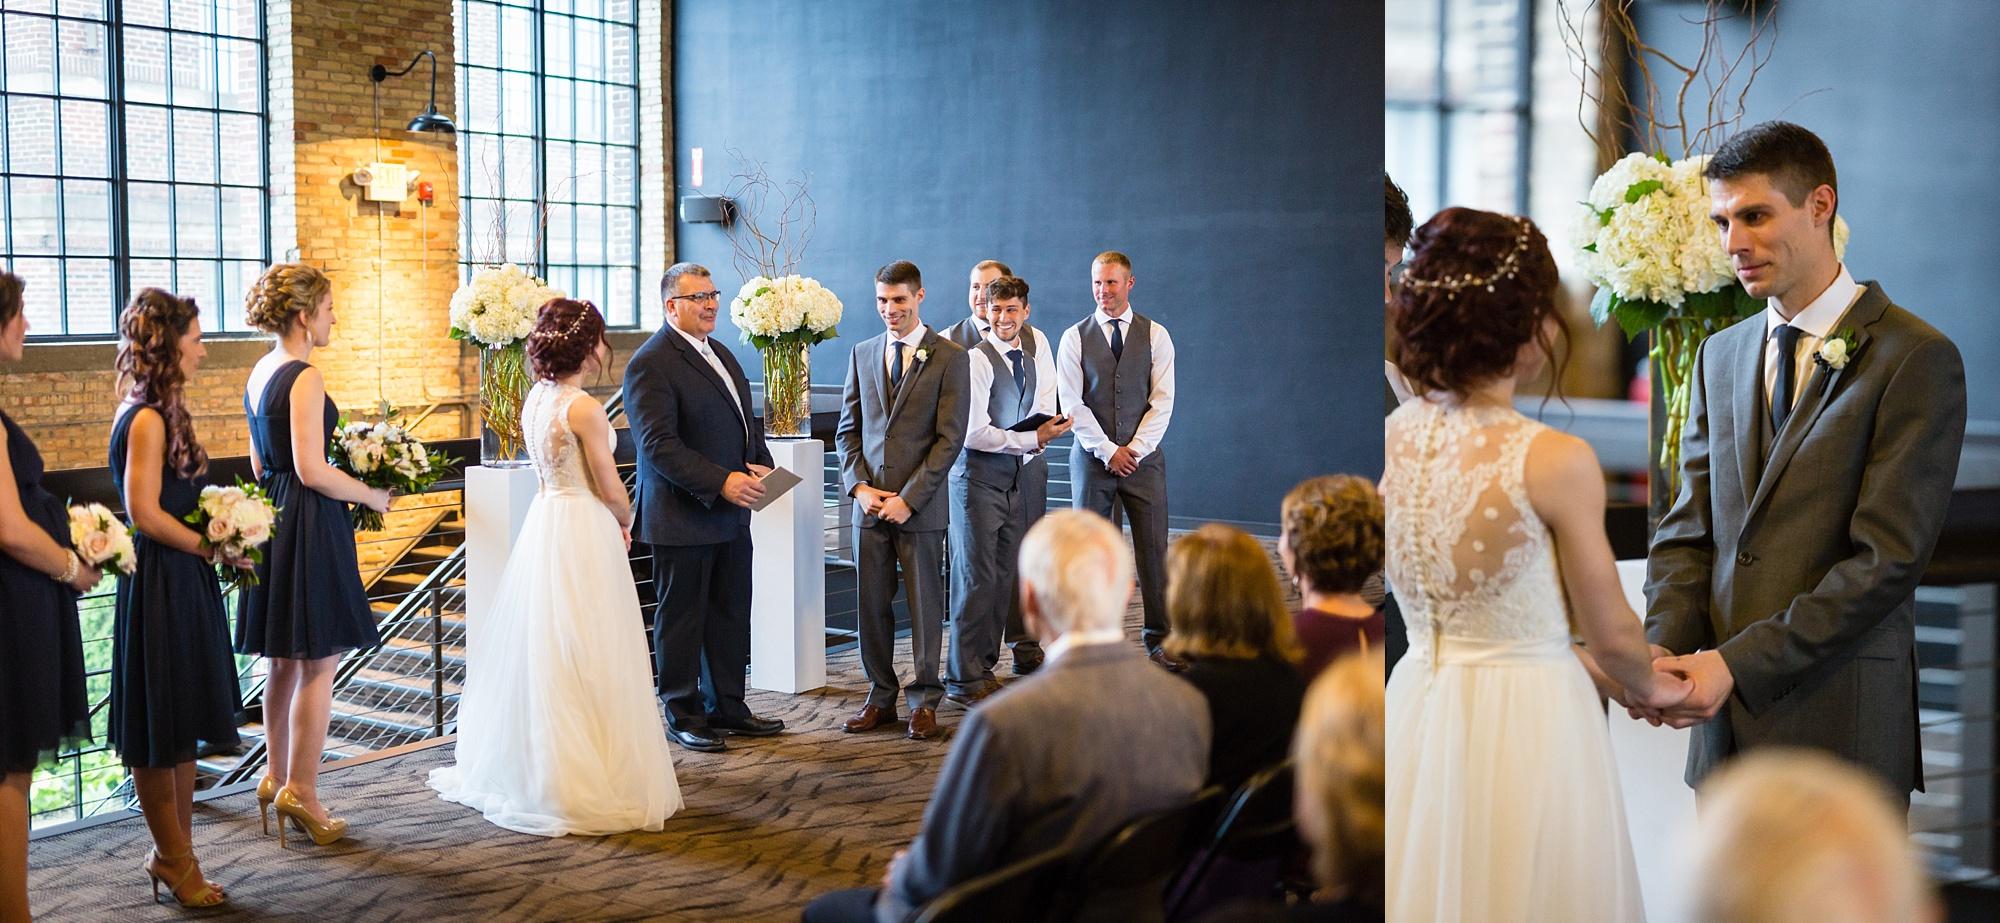 Brandon_Shafer_Photography_Lauren_Ethan_New_Vintage_Place_Grand_Rapids_Wedding_0038.jpg